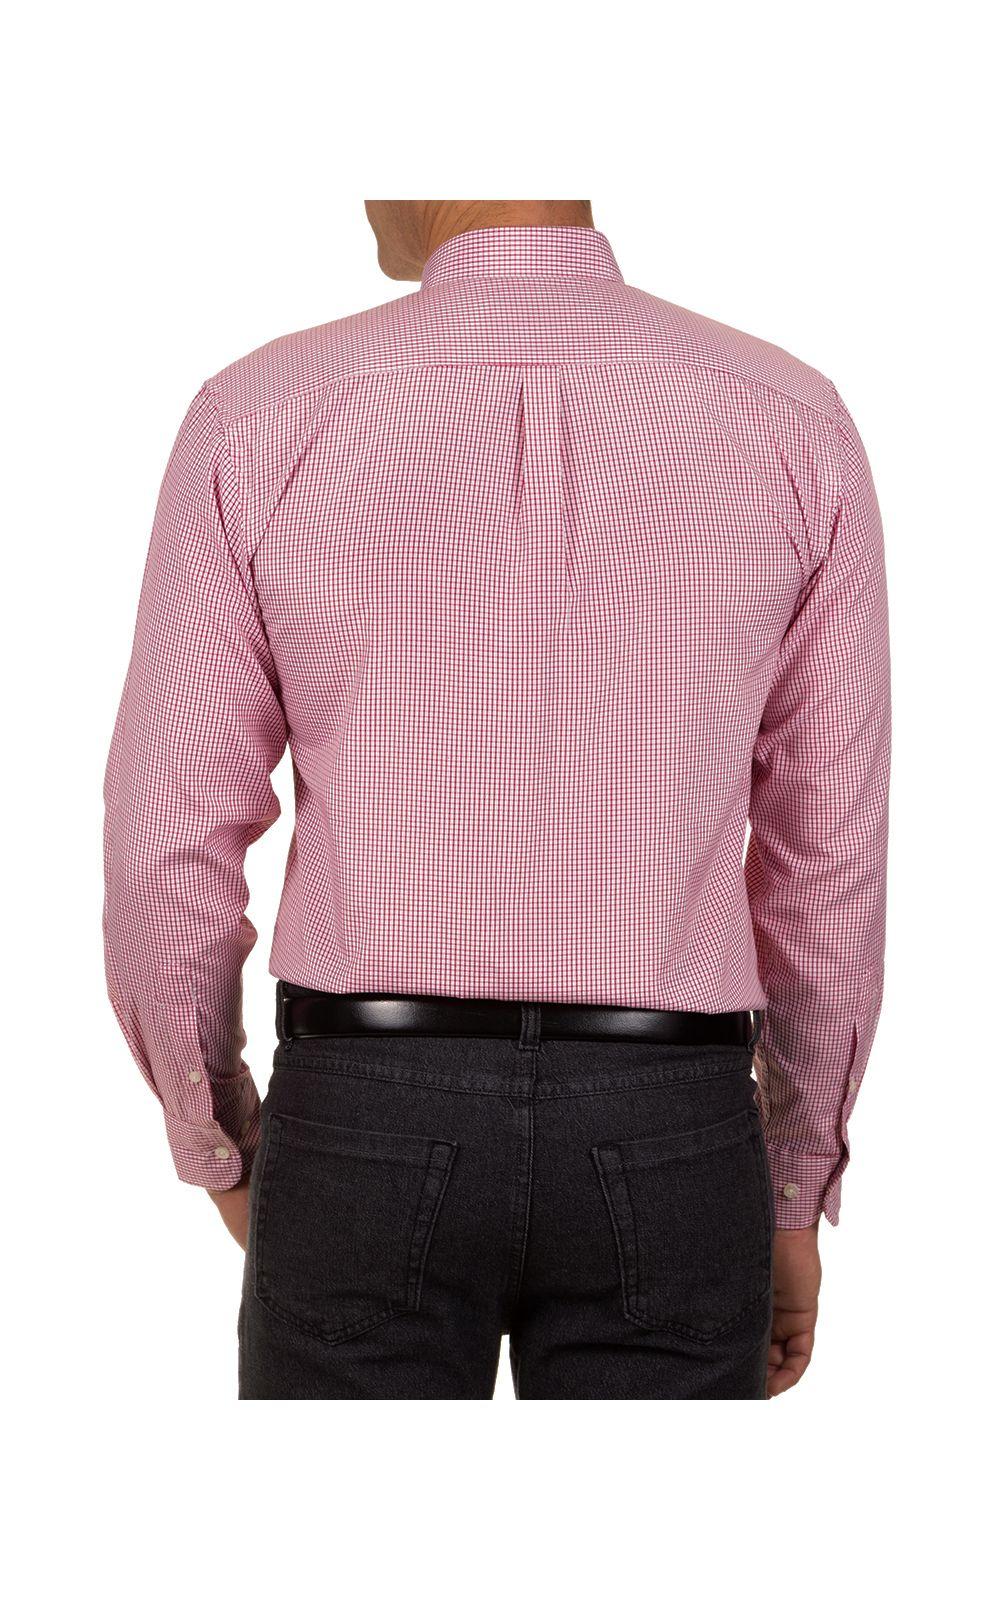 Foto 2 - Camisa Social Masculina Vermelha Xadrez